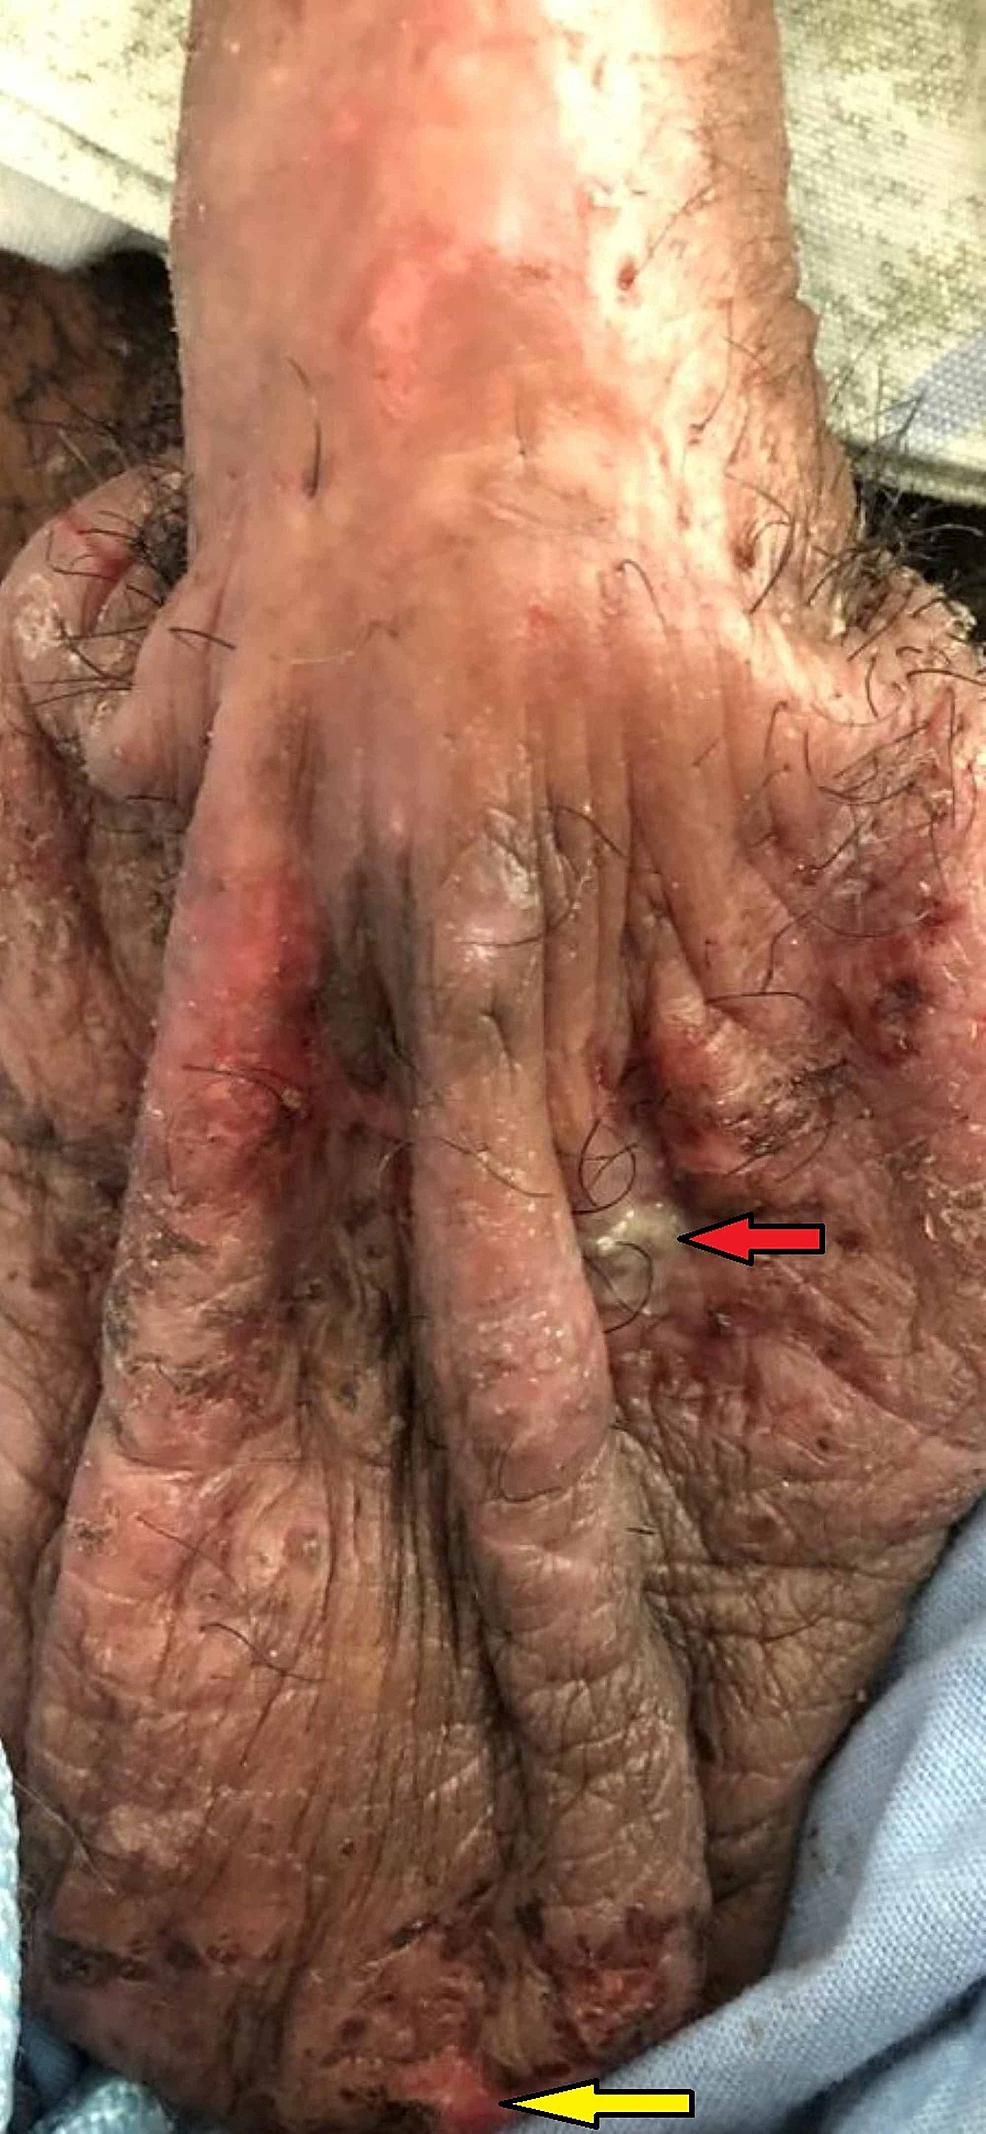 Genital-lesions